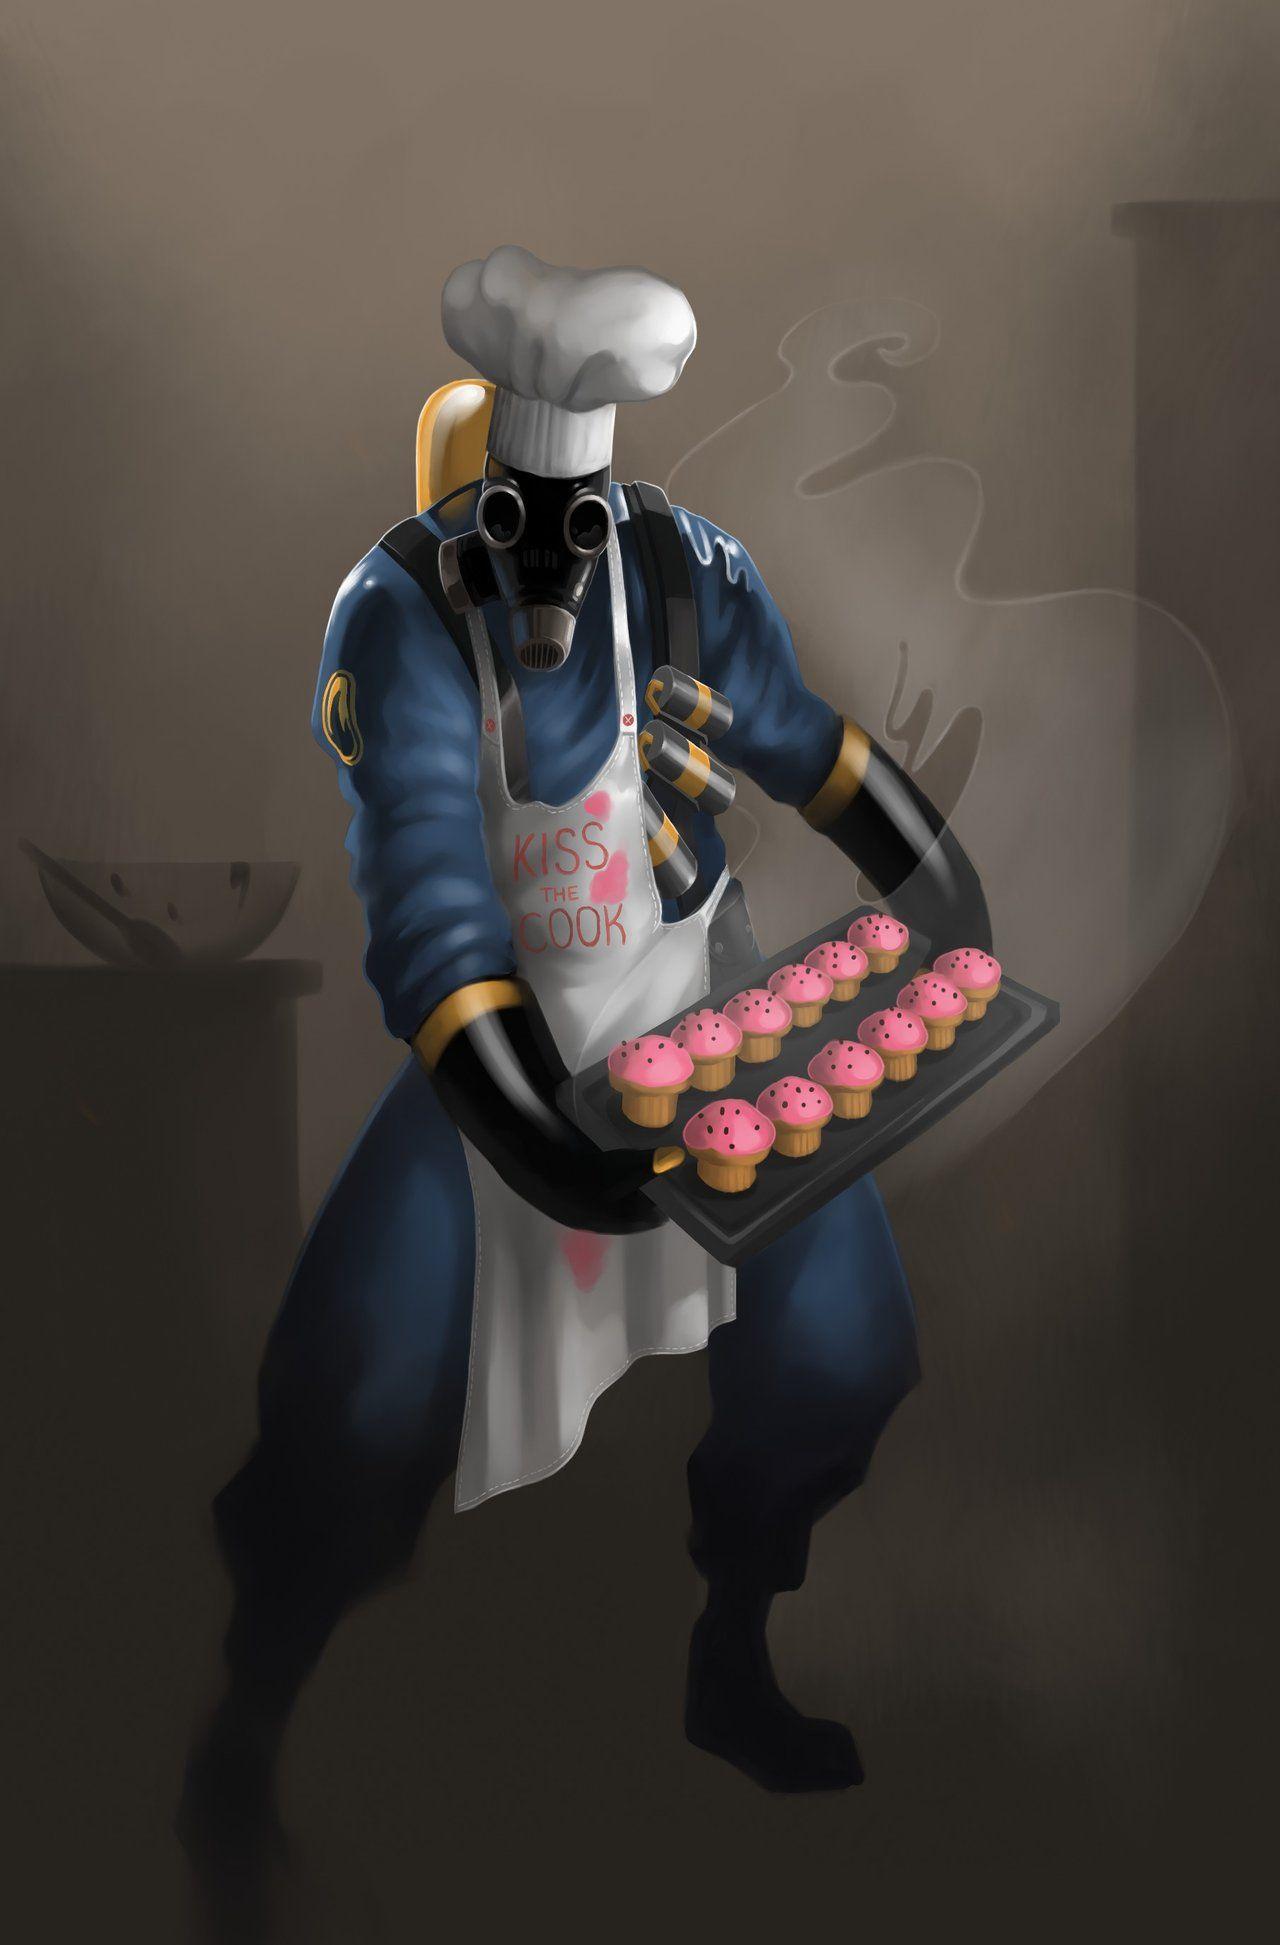 Cupcakes by vilssonify.deviantart.com #TF2 Pyro